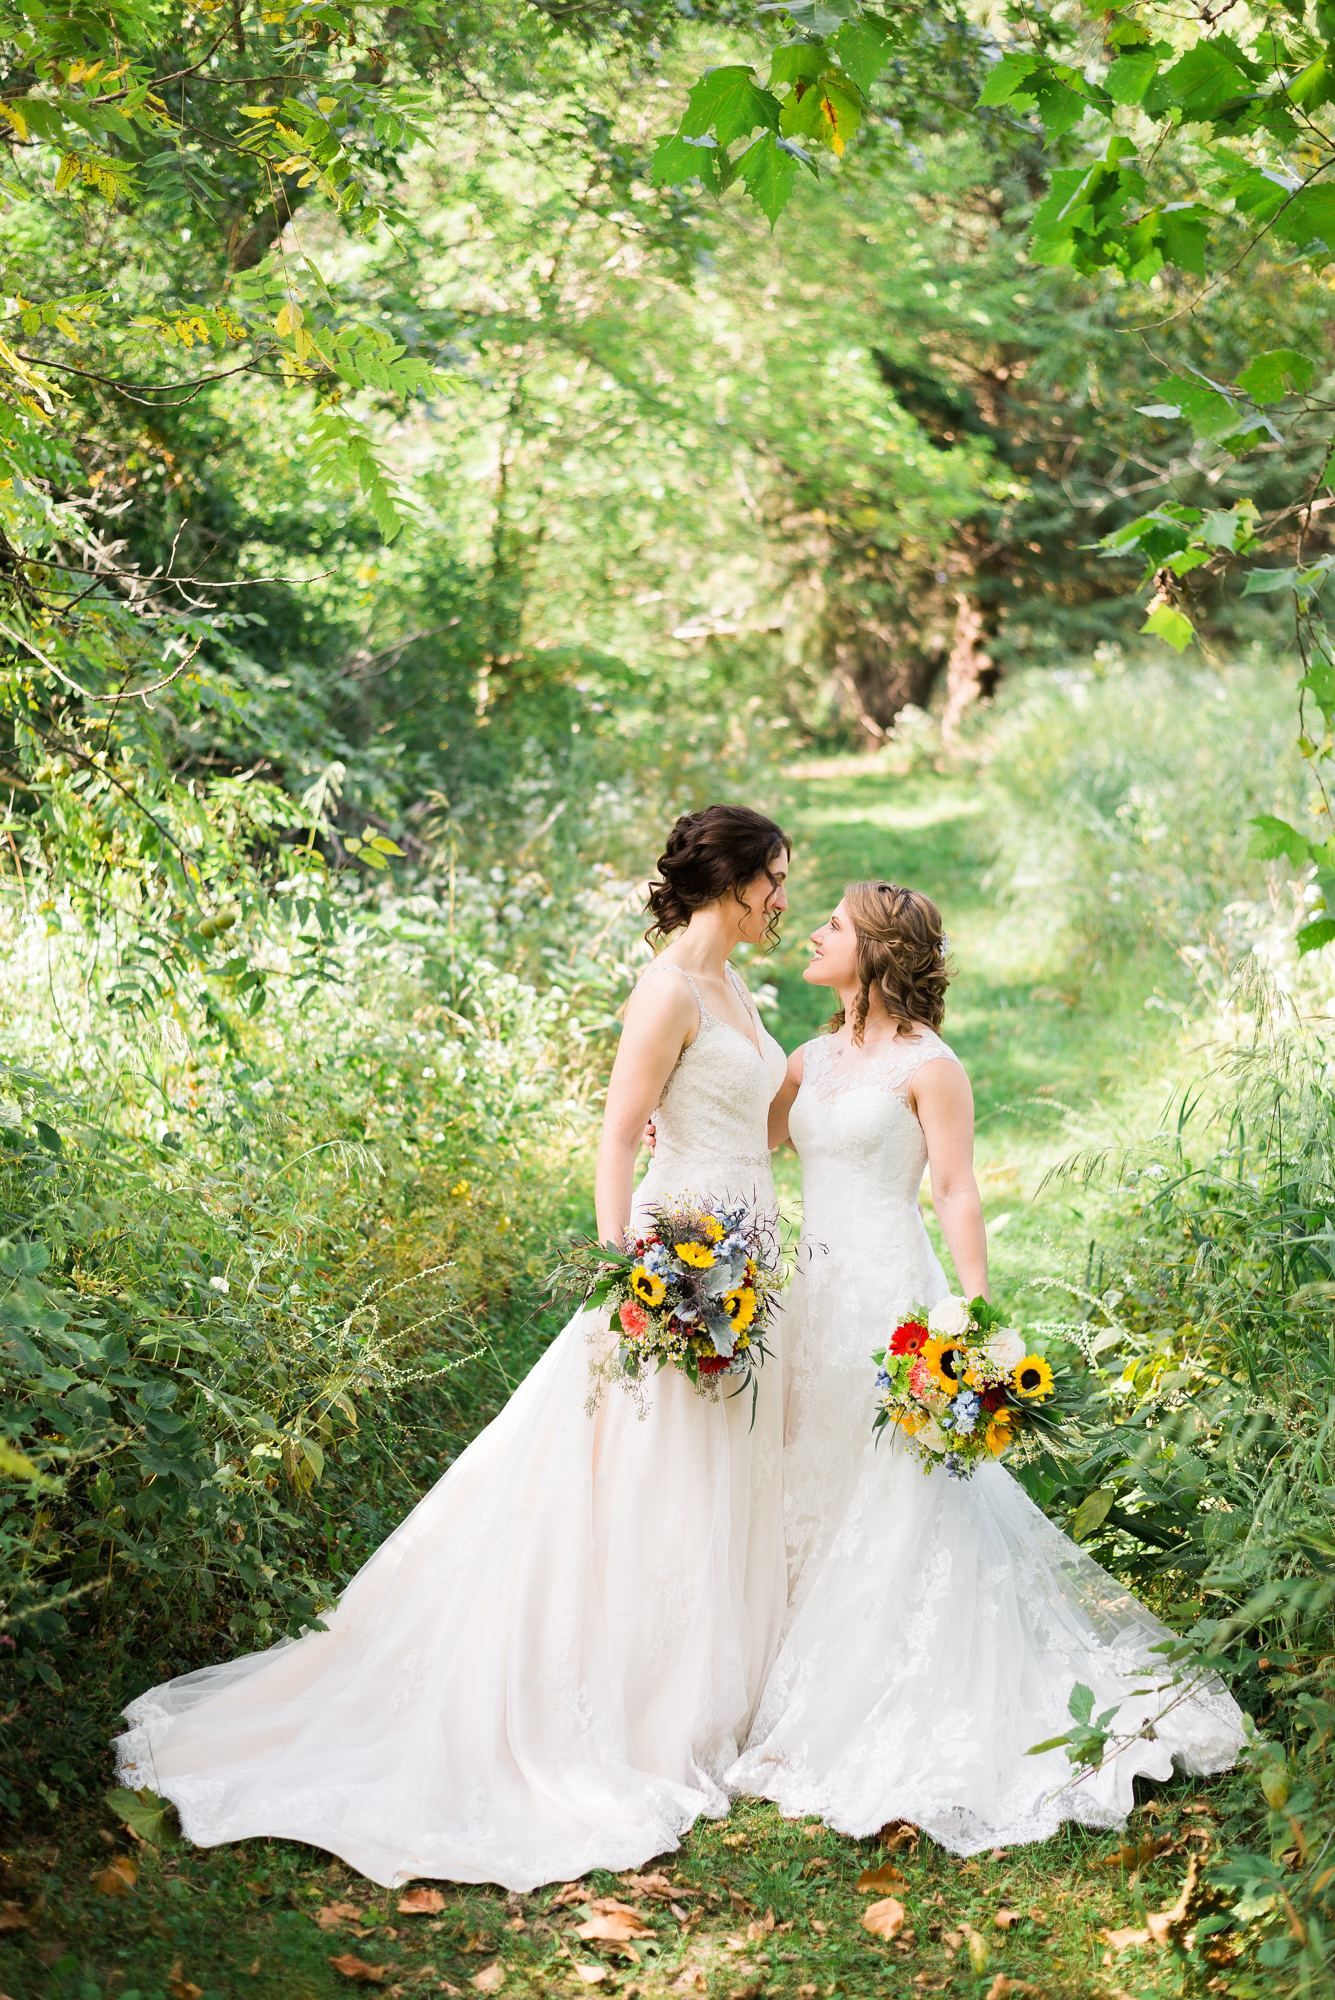 Macbride Lake - Solon, Iowa, Wedding Photographer